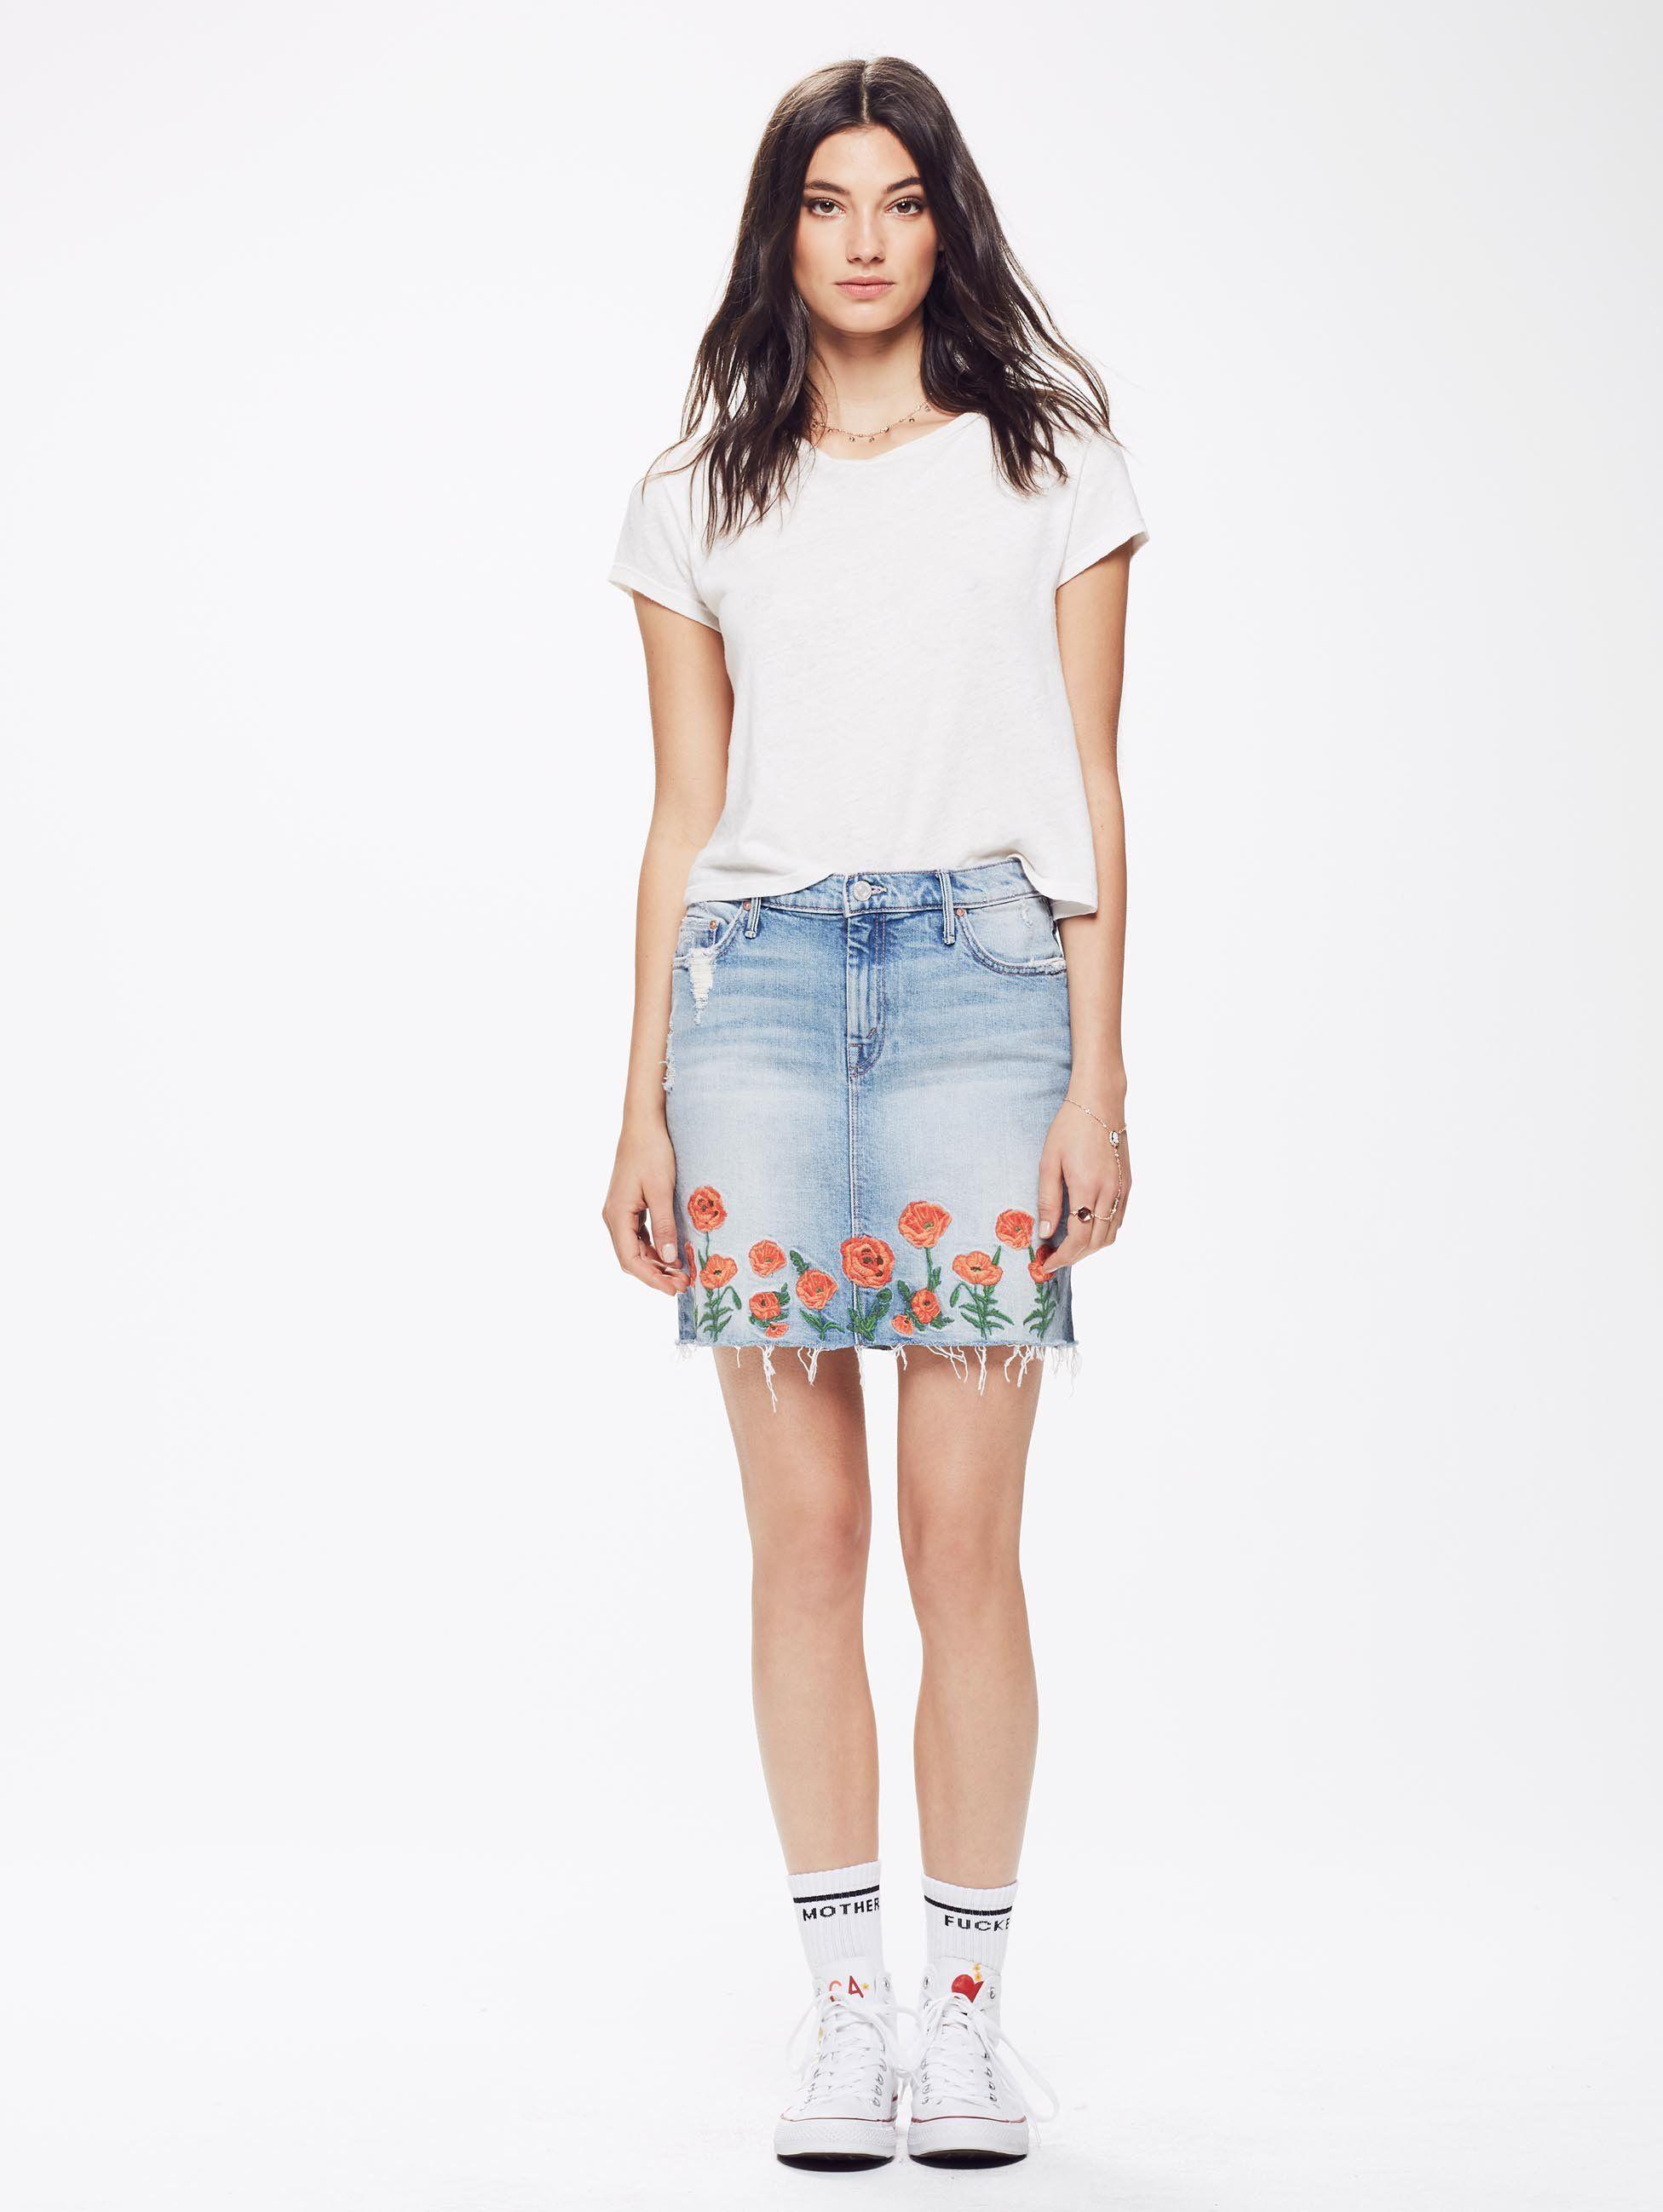 How to high wear waisted denim skirts